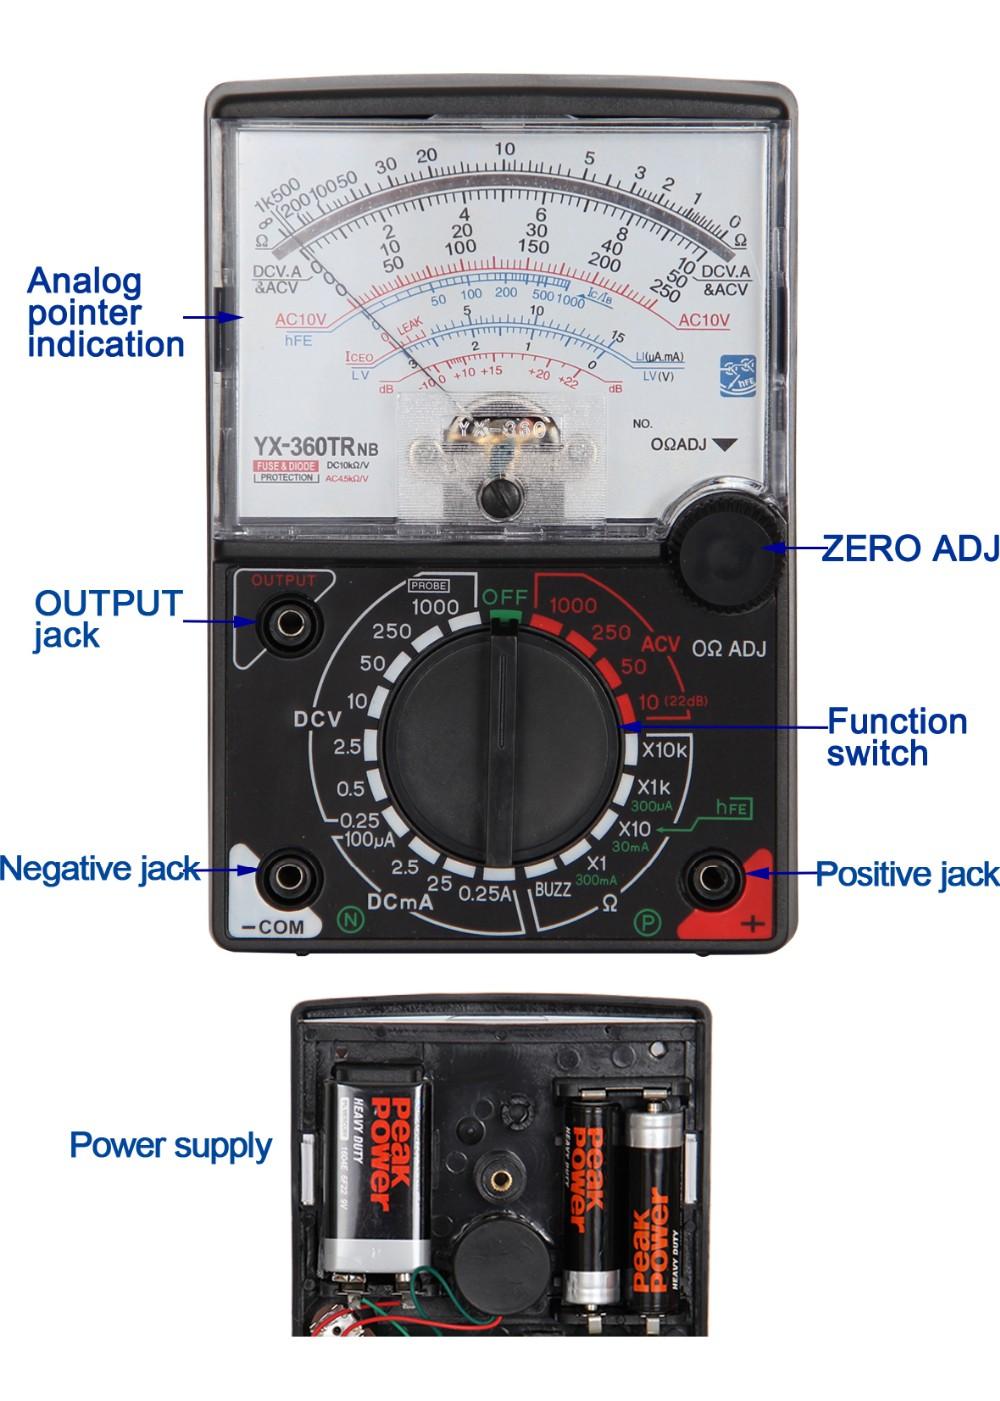 Analog Multimeter Analog Meter Multimeter Voltage Meter Current Meter Yx360  Tester Yx360trnb - Buy Sanwa Analog Multimeter,Digital Analog